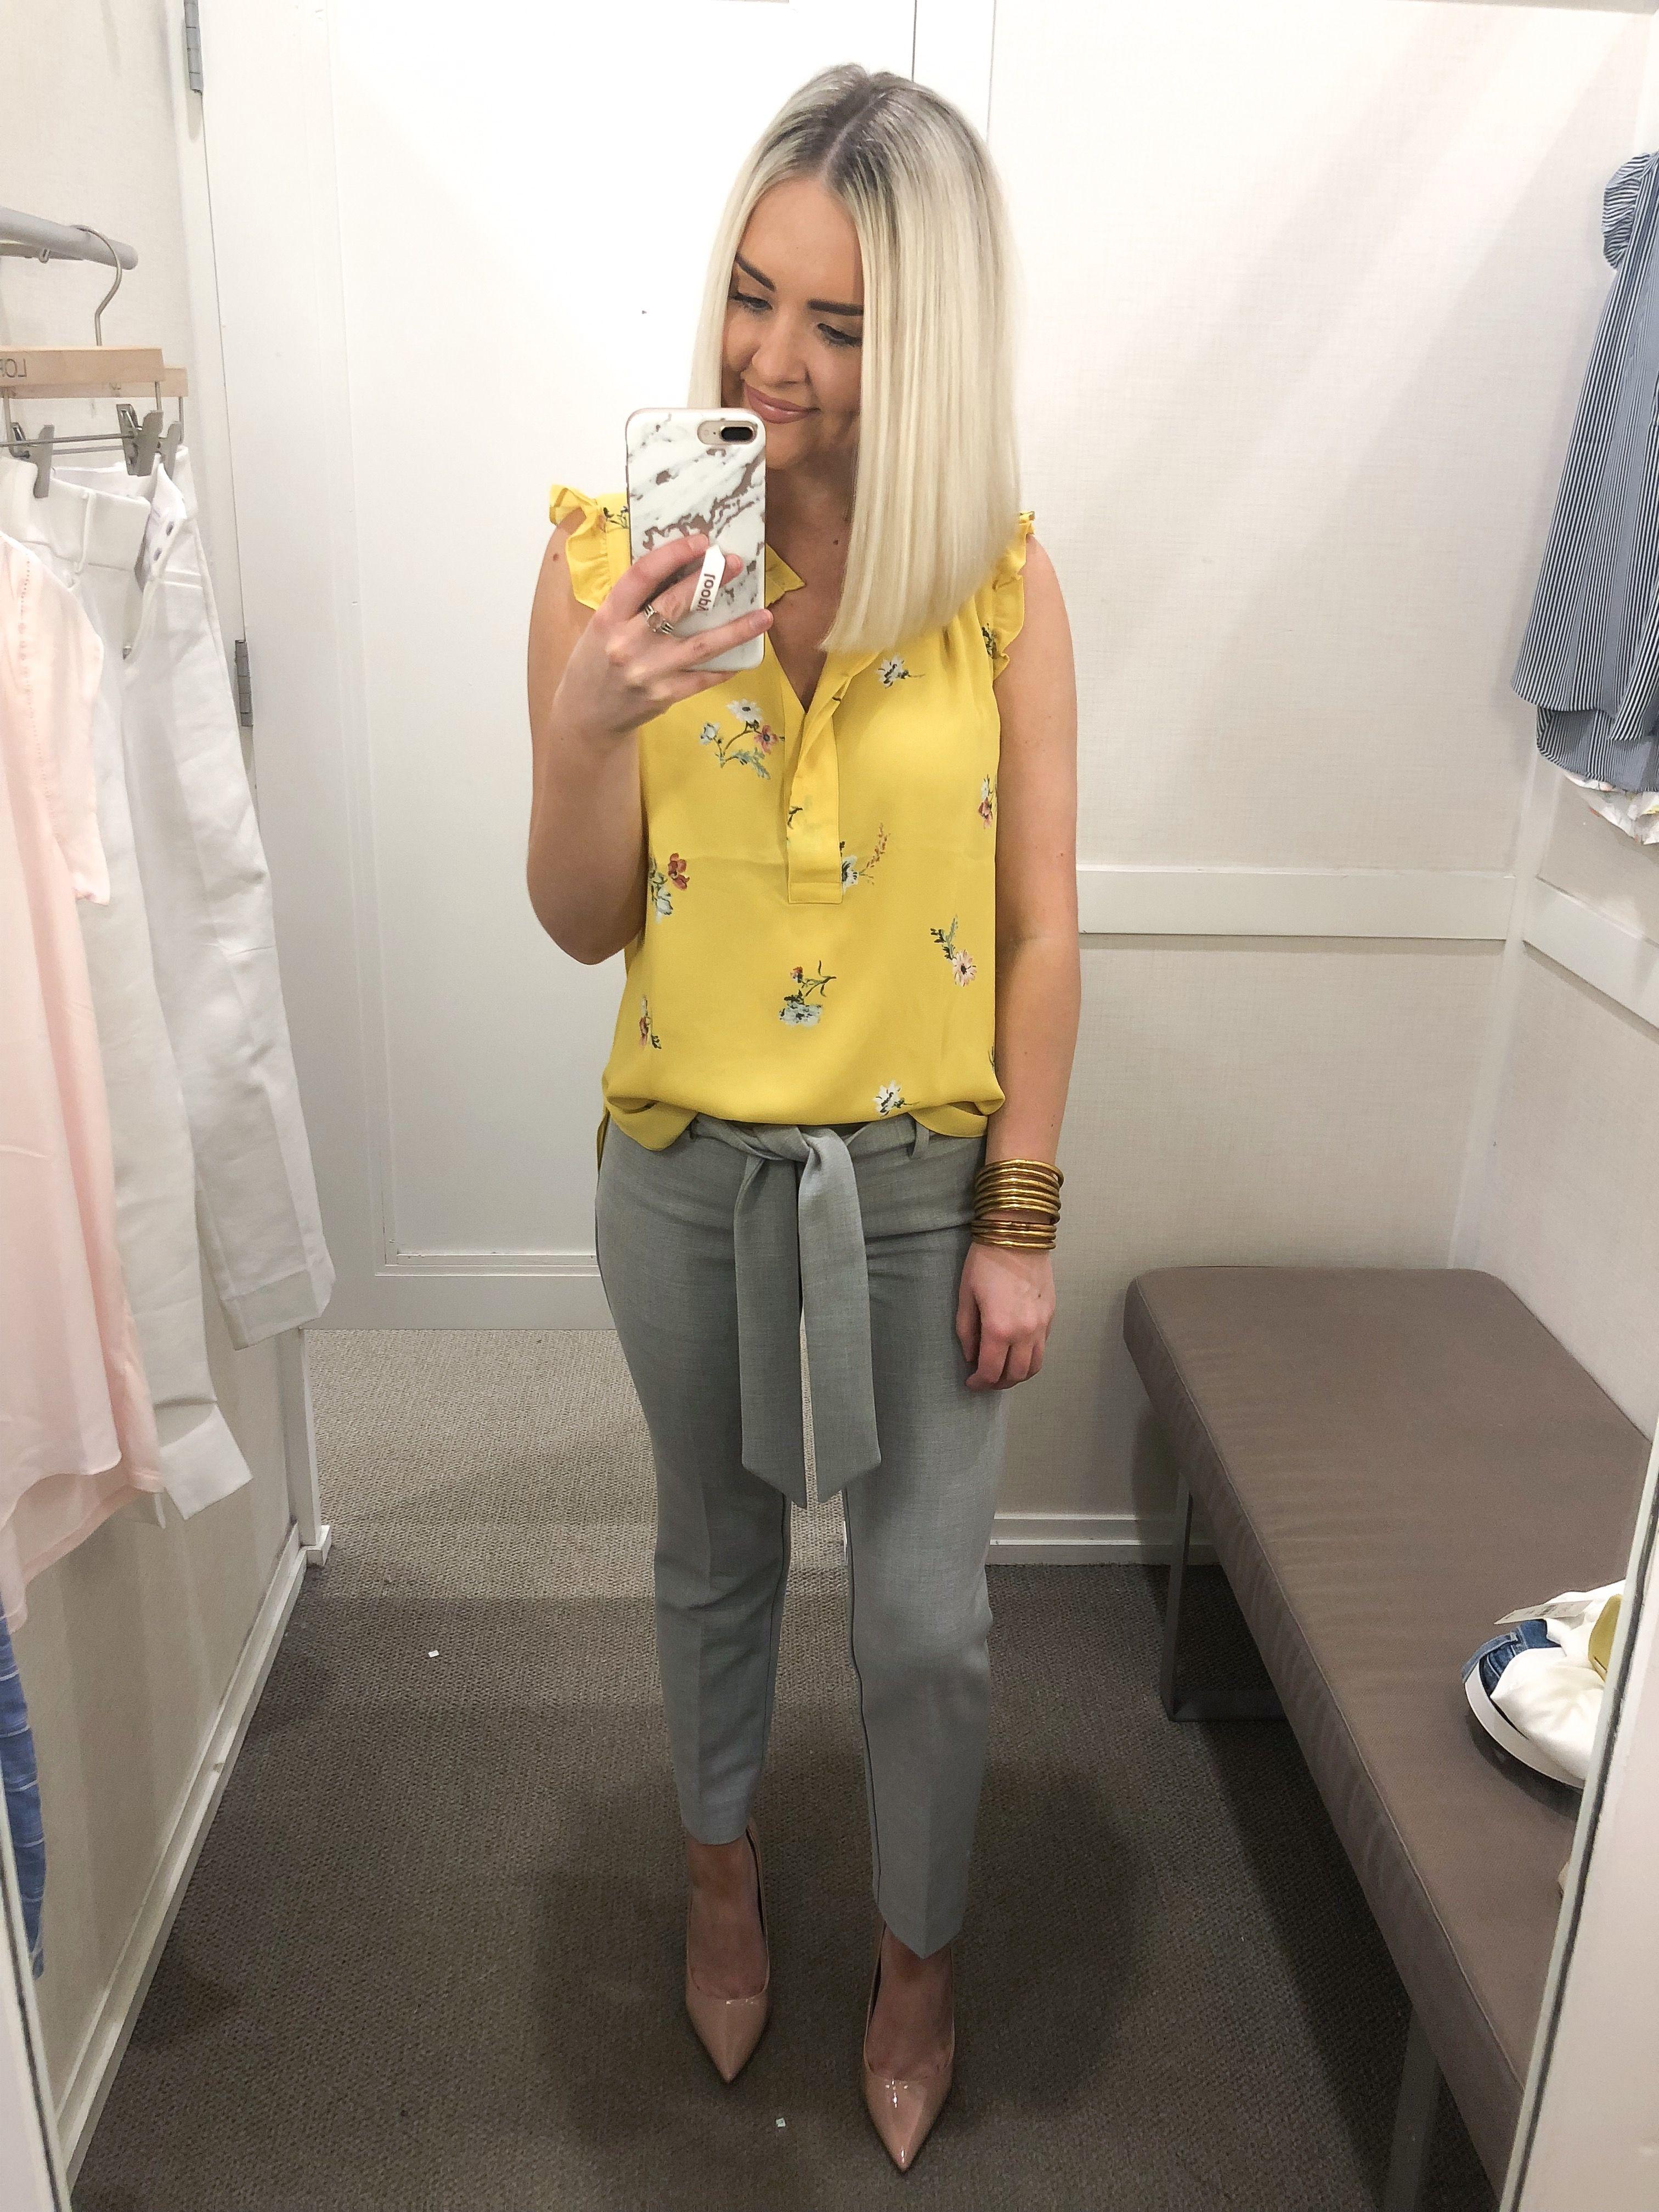 Sassy Southern Blonde - A Fashion & Lifestyle Blog by Kelsie Bynum